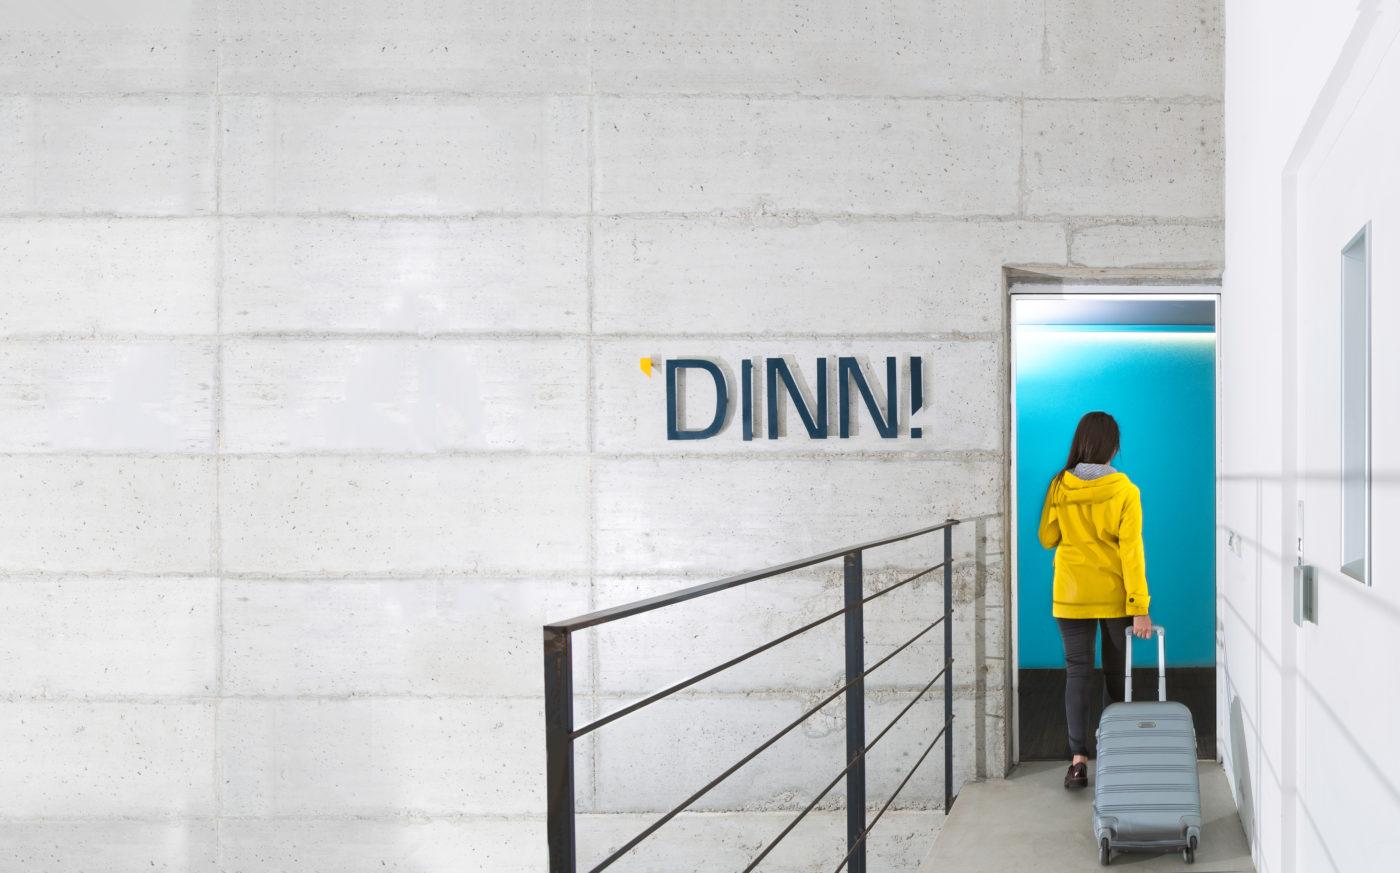 L'ingresso degli uffici milanesi di DINN!